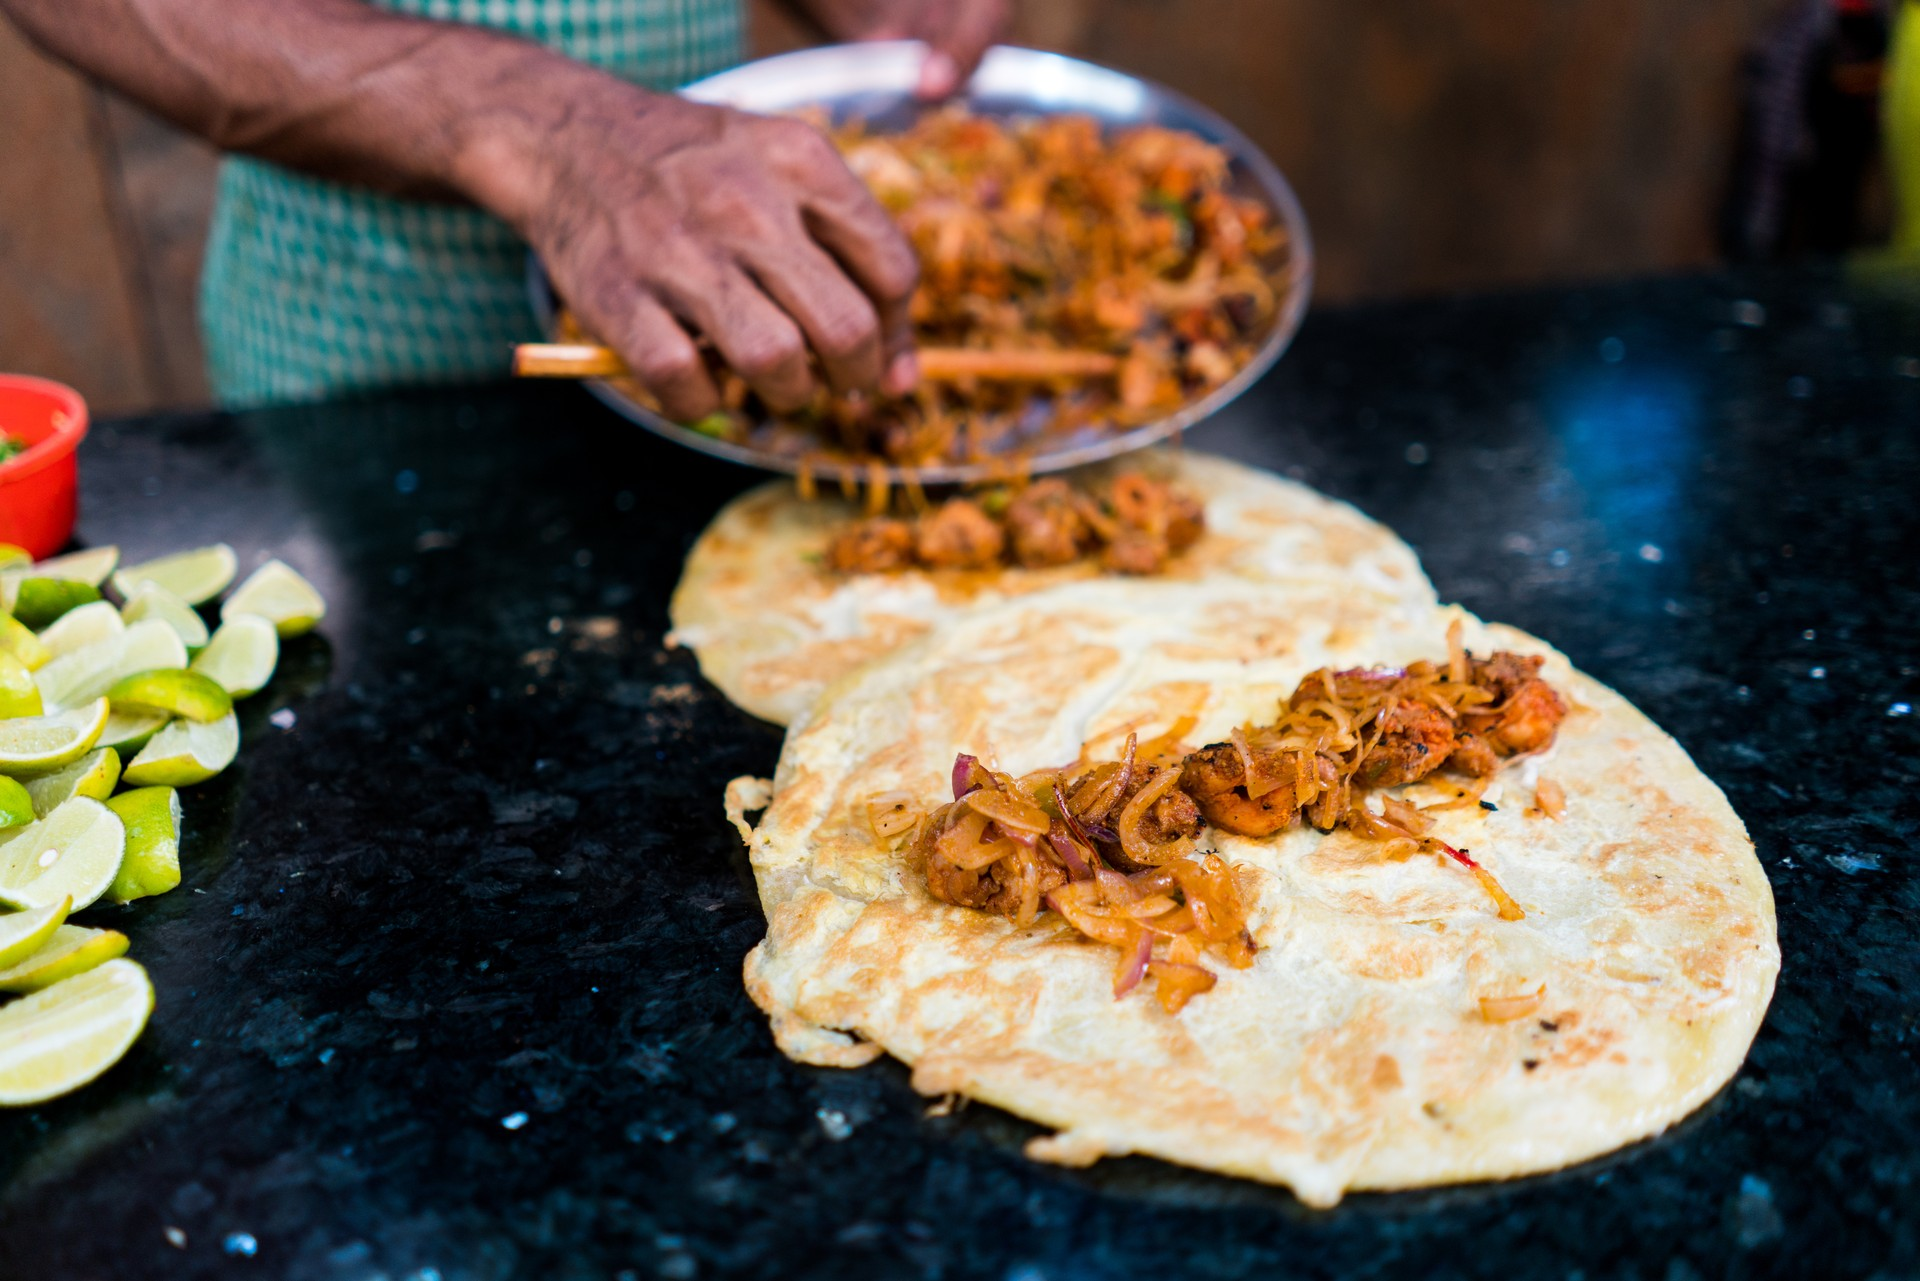 India food tour - Kathi rolls